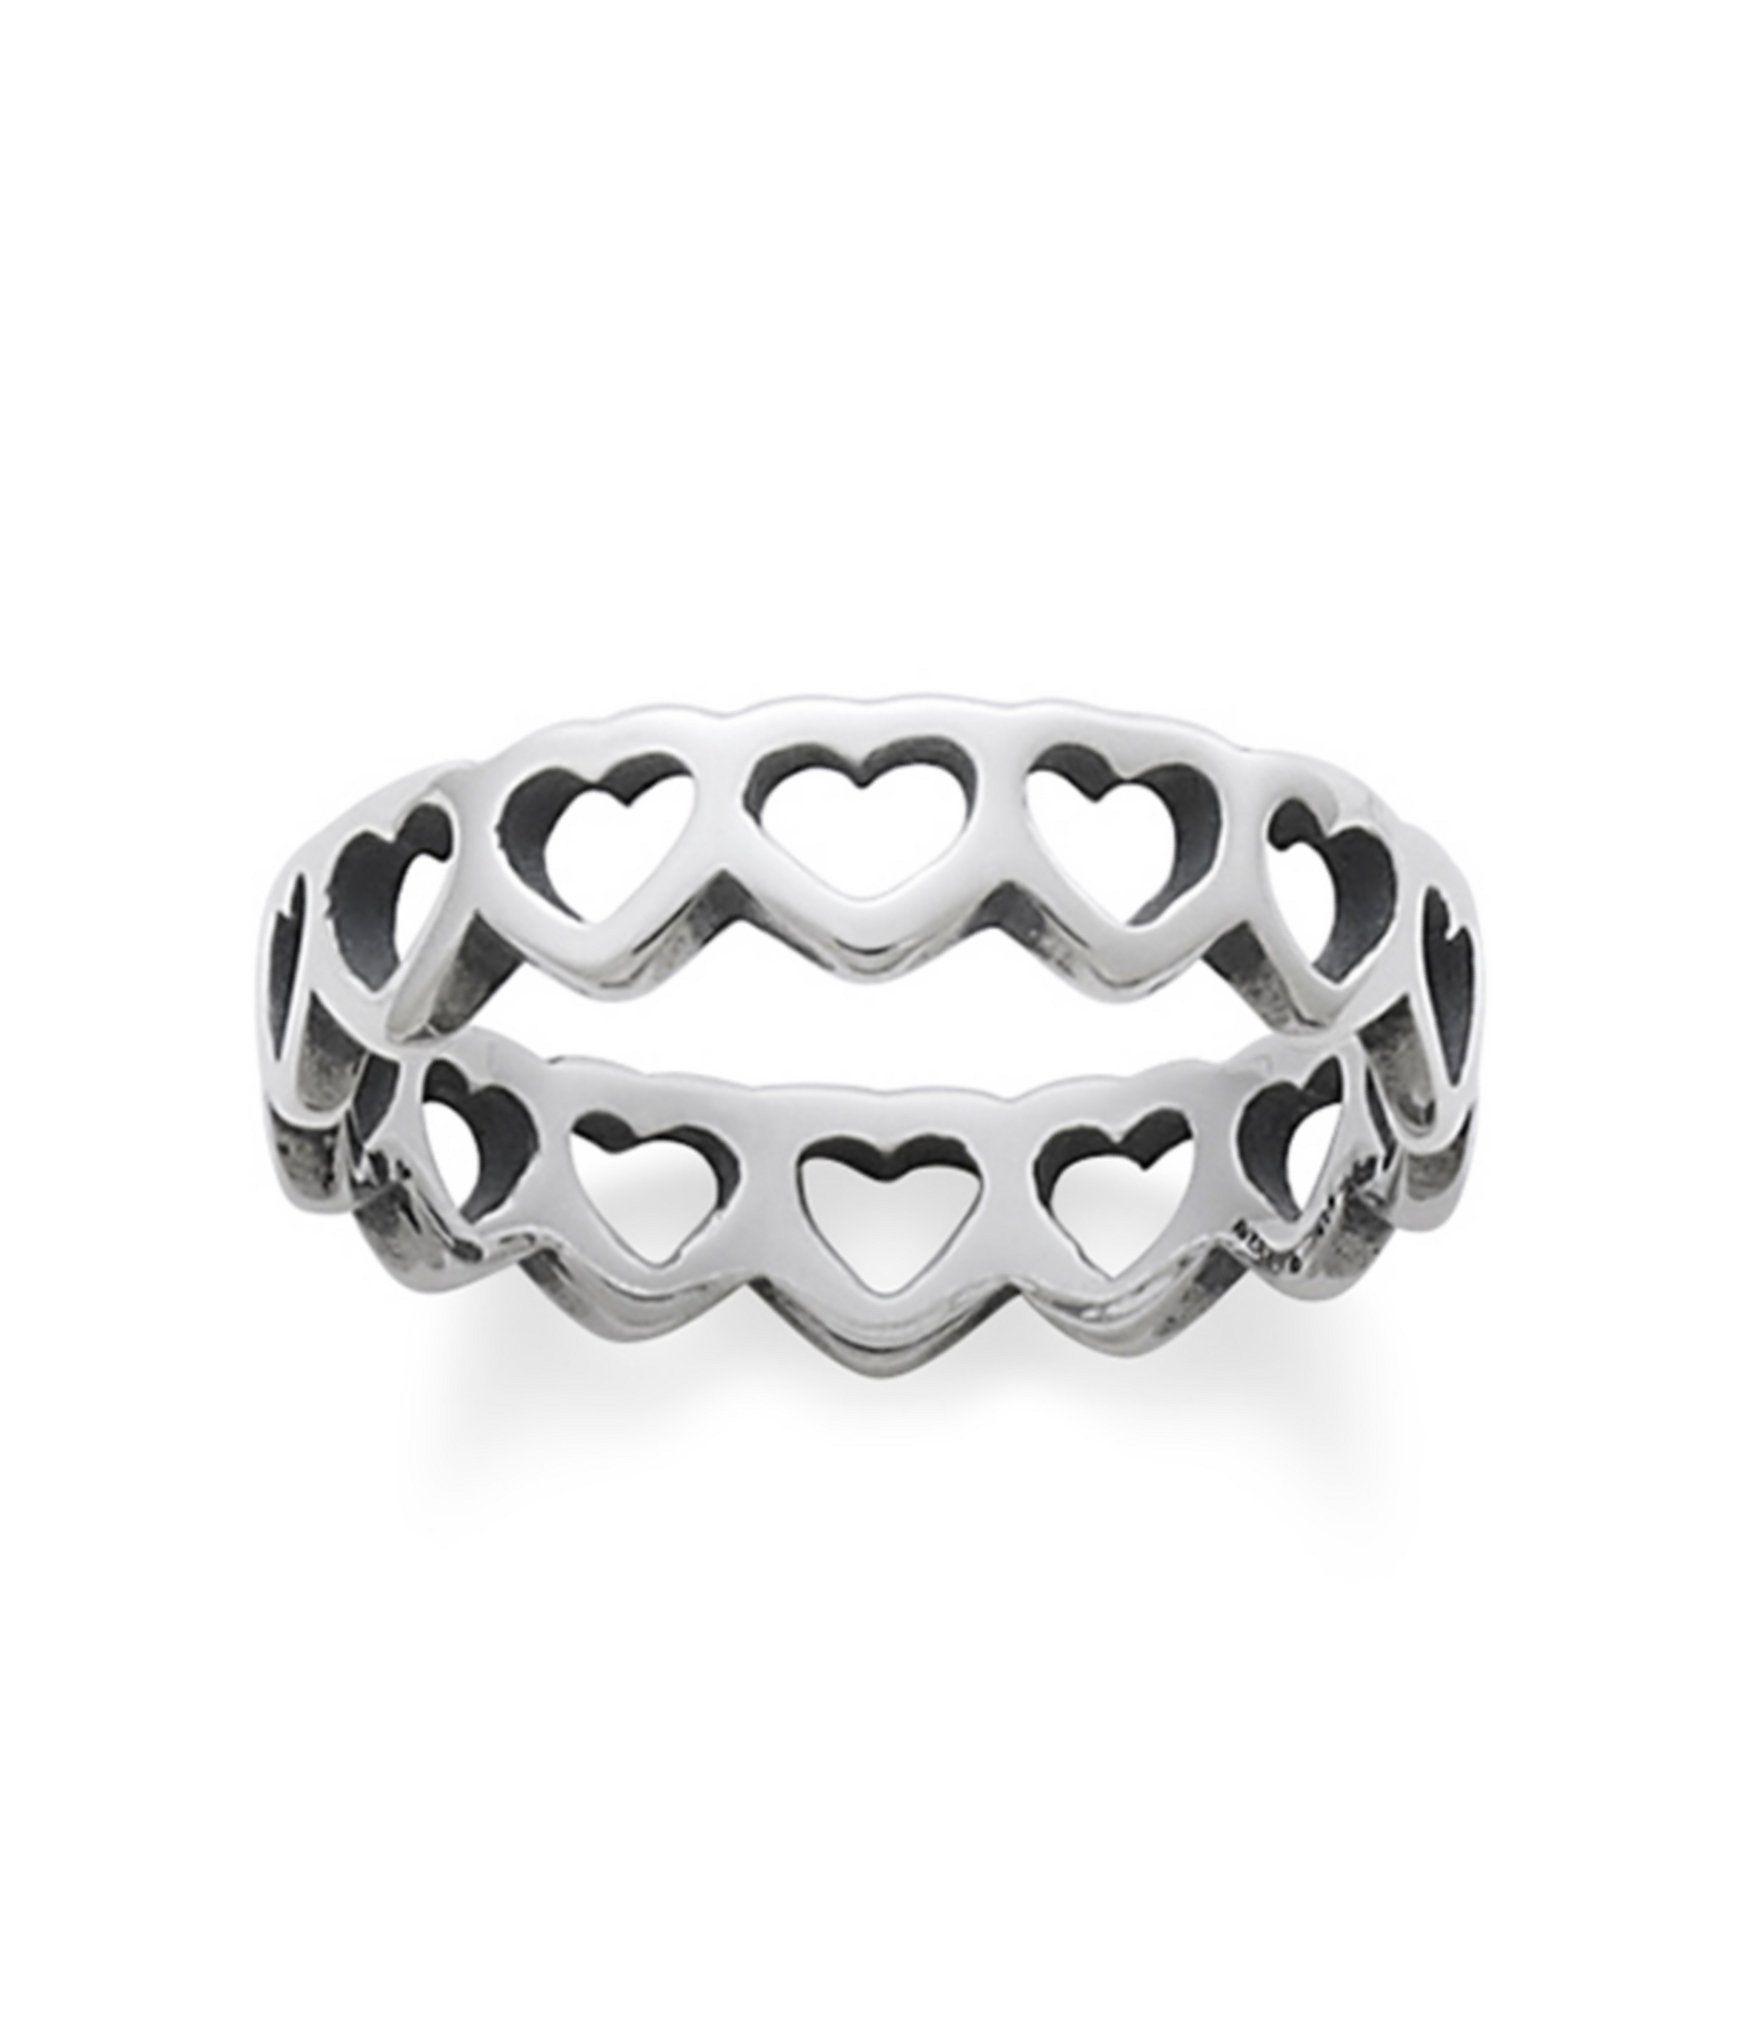 james-avery-rings